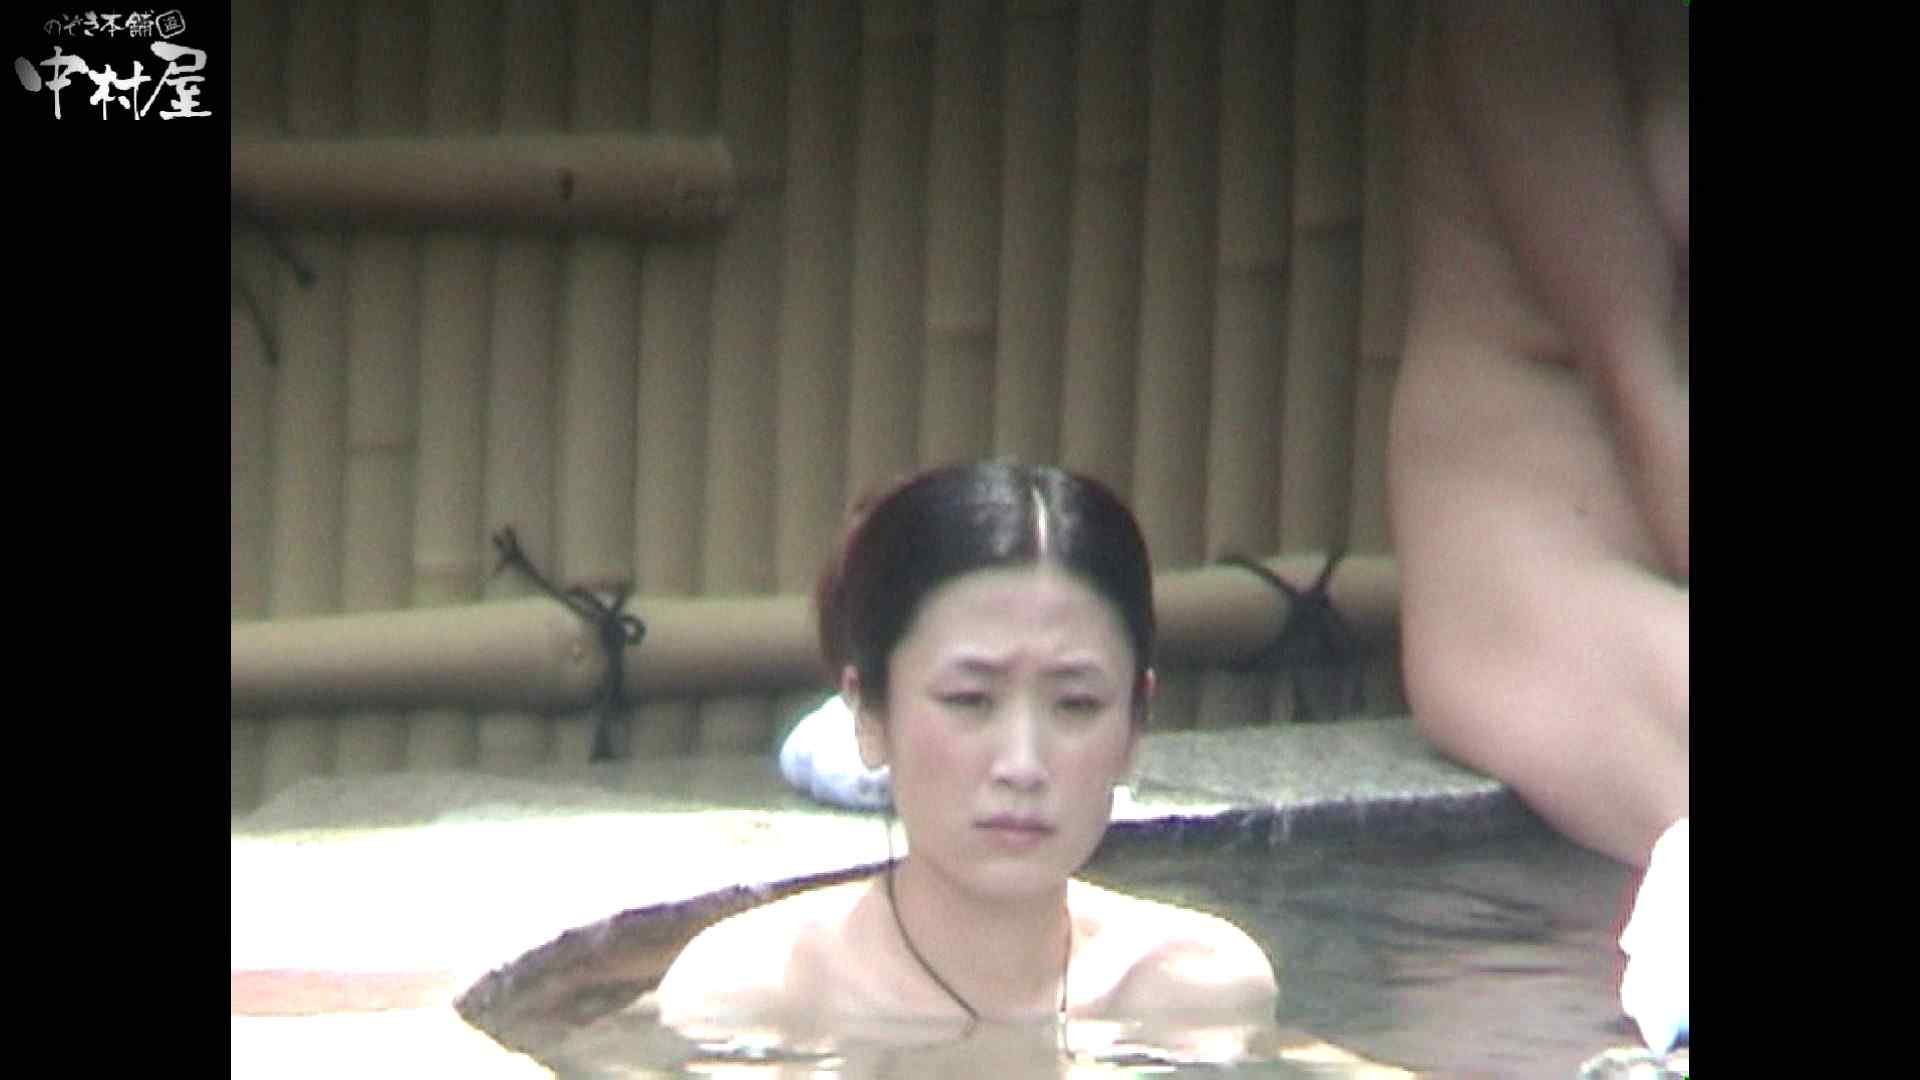 Aquaな露天風呂Vol.934 OLセックス | 露天  66画像 34